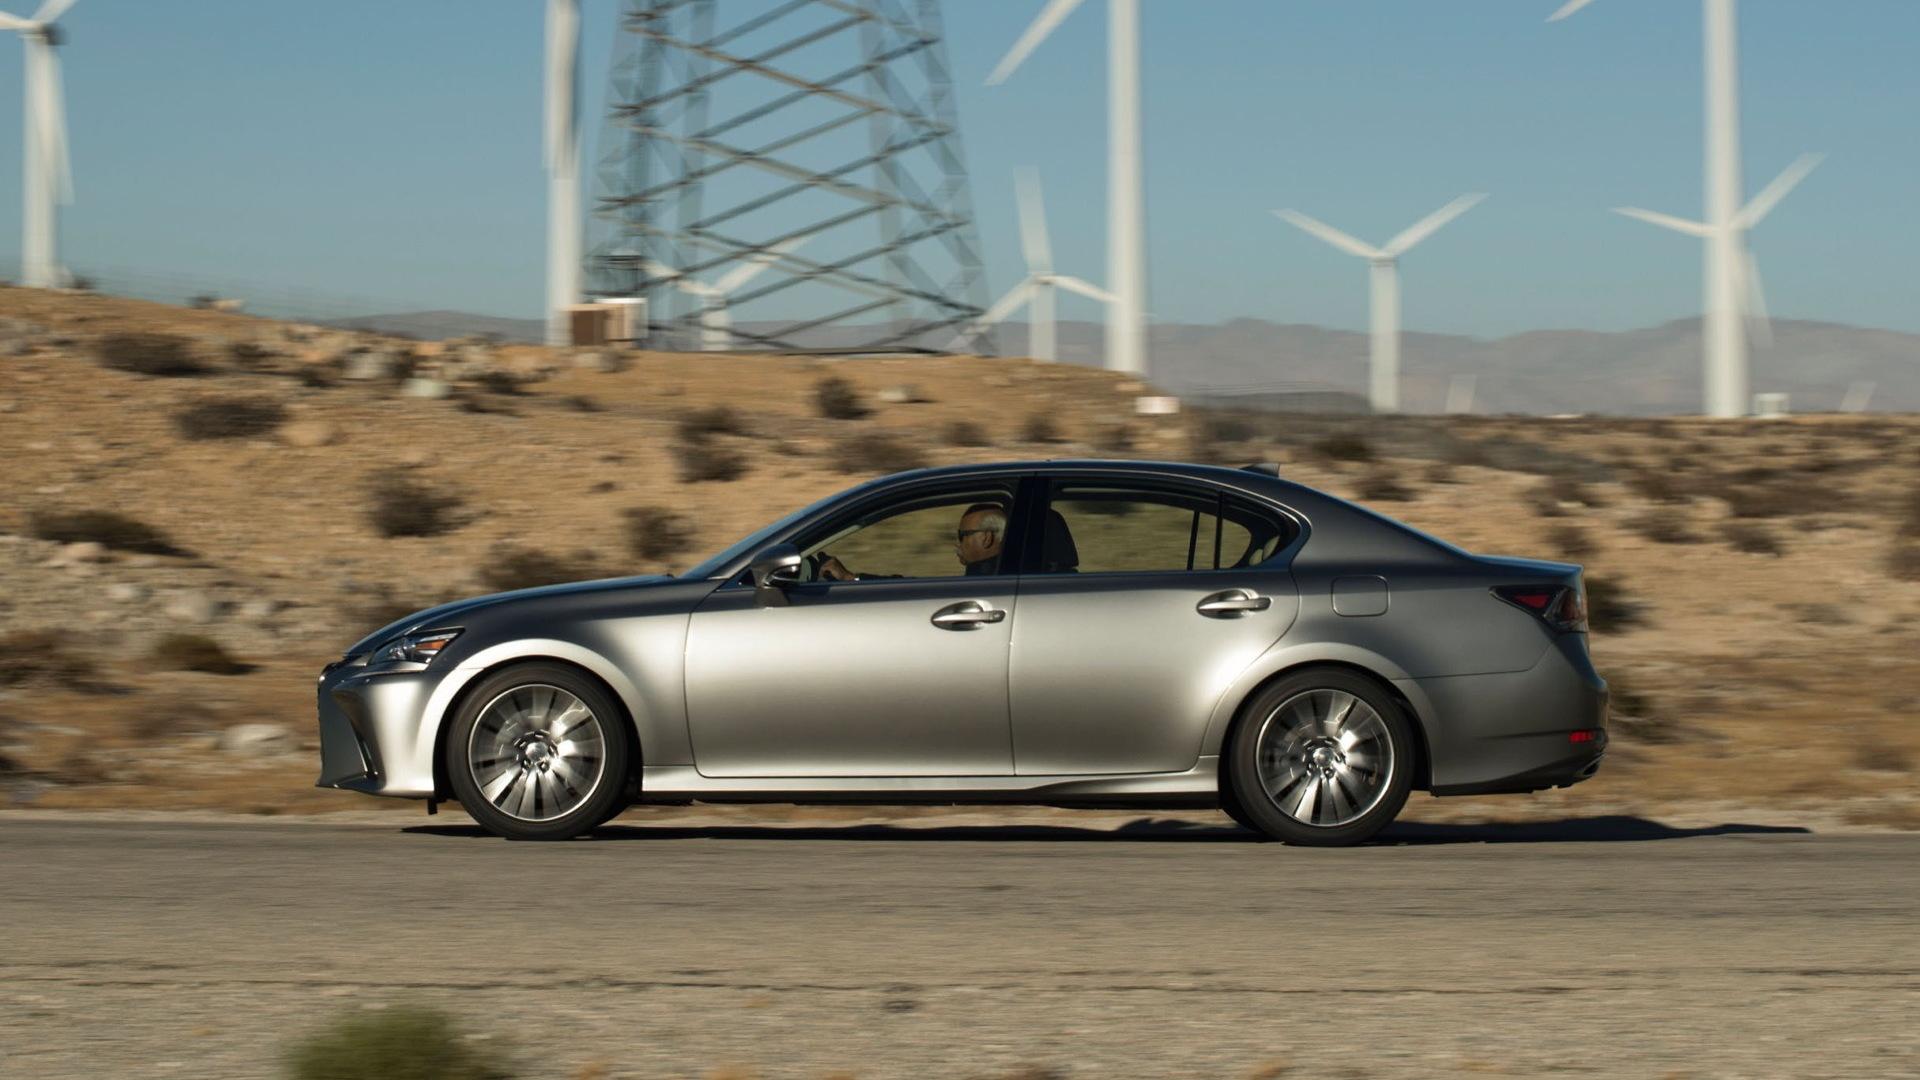 2016 Lexus GS 200t